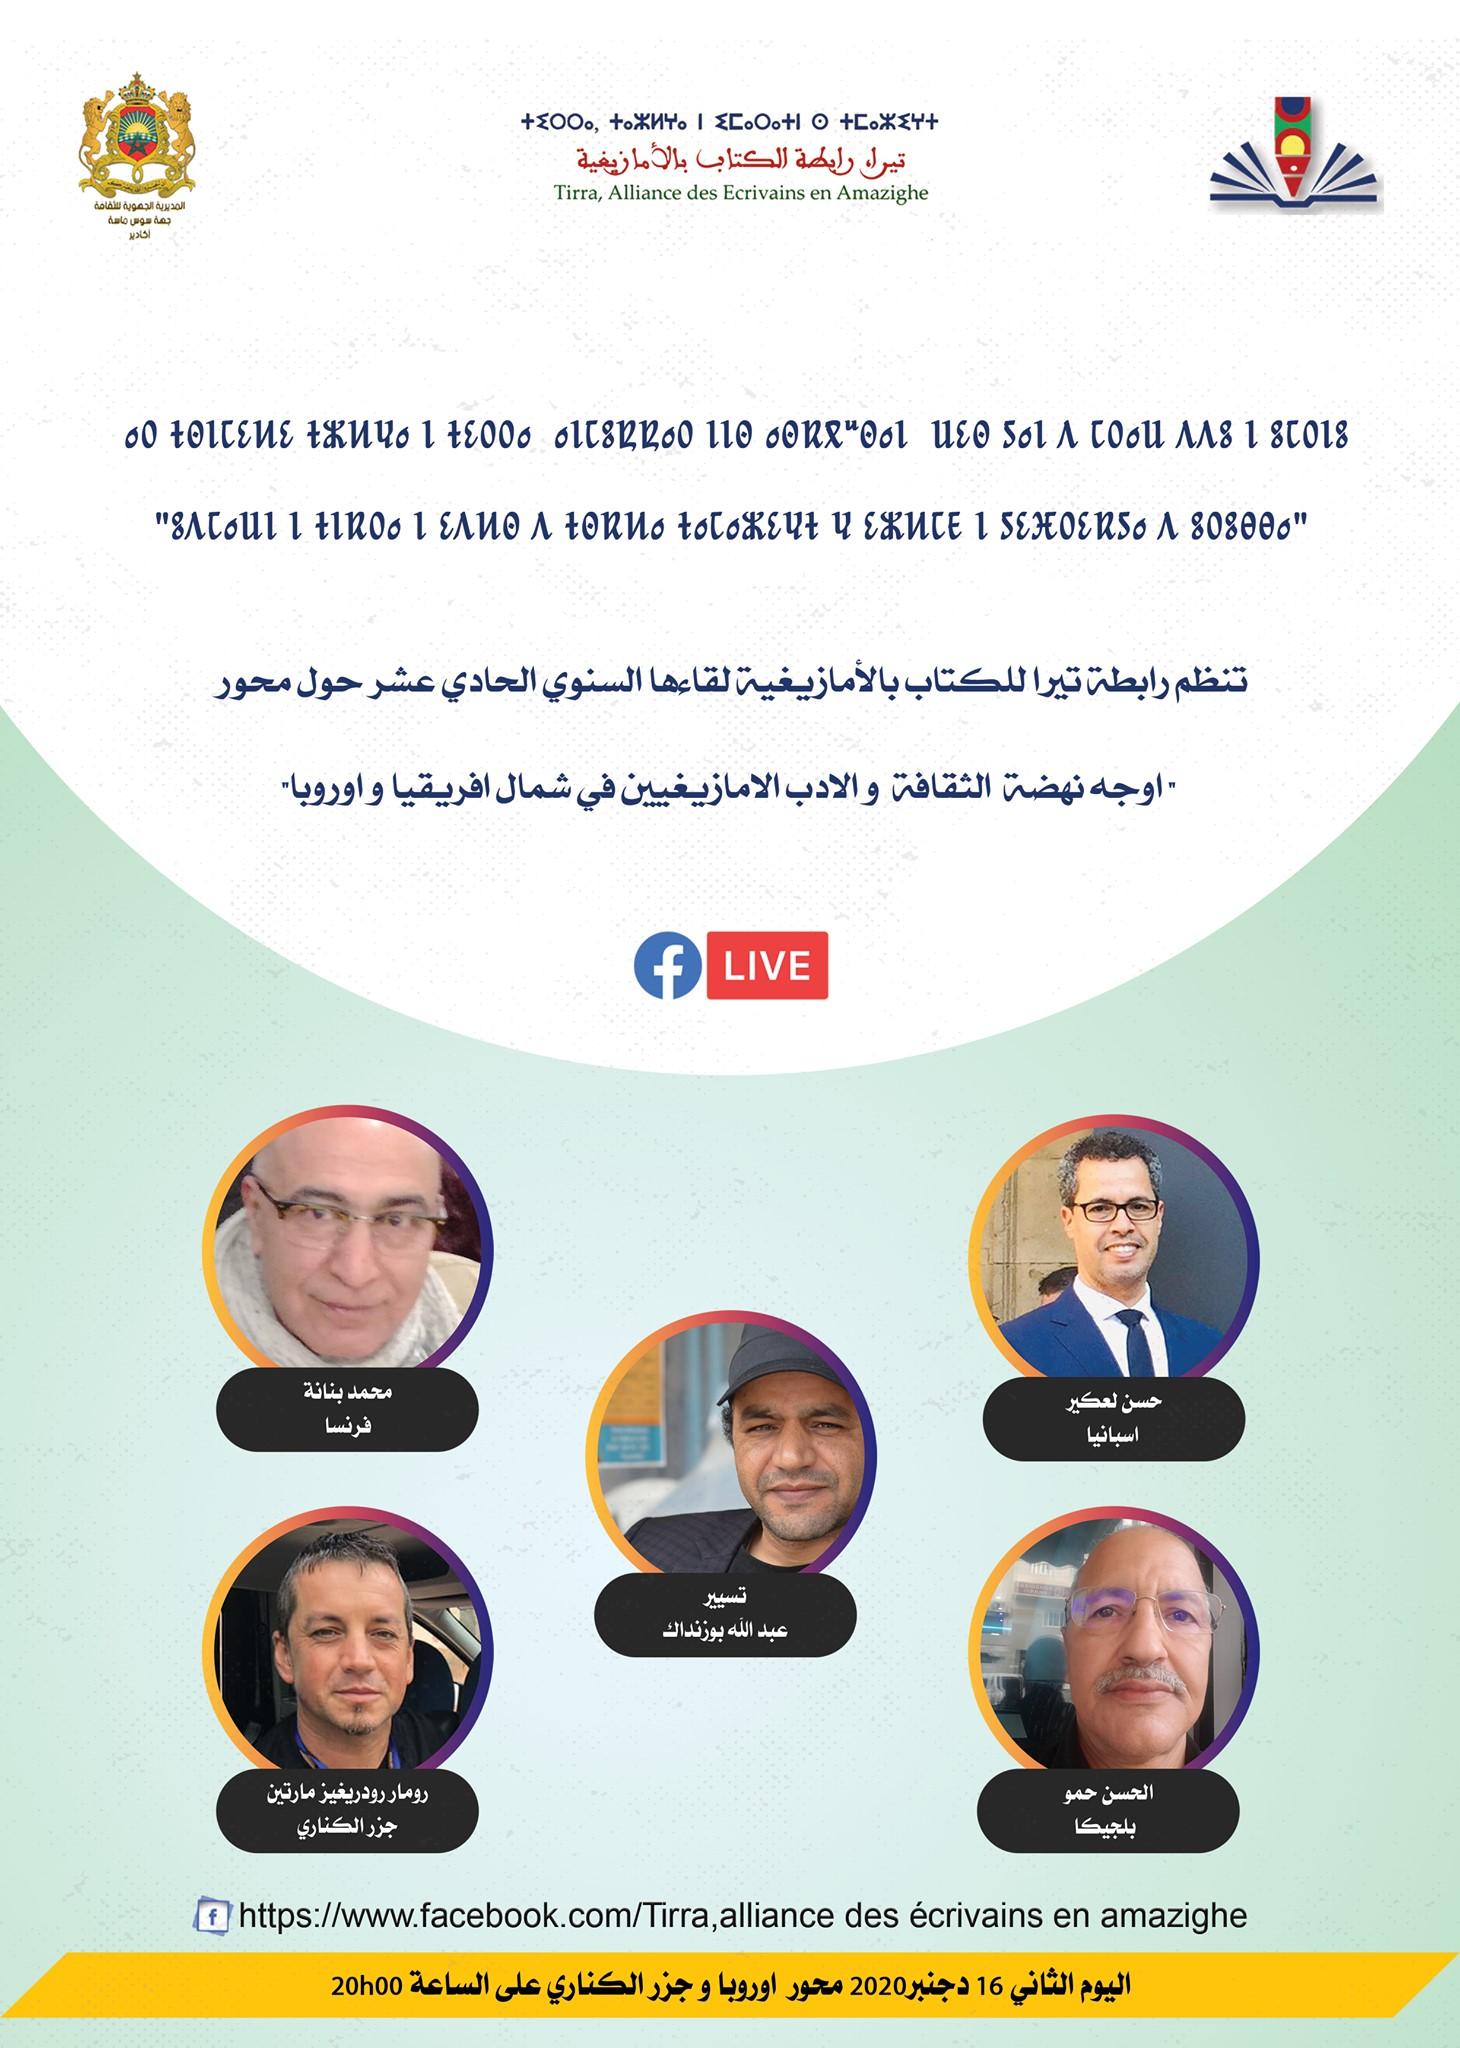 Read more about the article ⴰⵏⵎⵓⵇⵇⴰⵔ ⵏ ⵜⵣⵍⵖⴰ ⵏ ⵜⵉⵔⵔⴰ – لقاء أدبي من تنظيم رابطة تيرا للكتاب بالأمازيغية